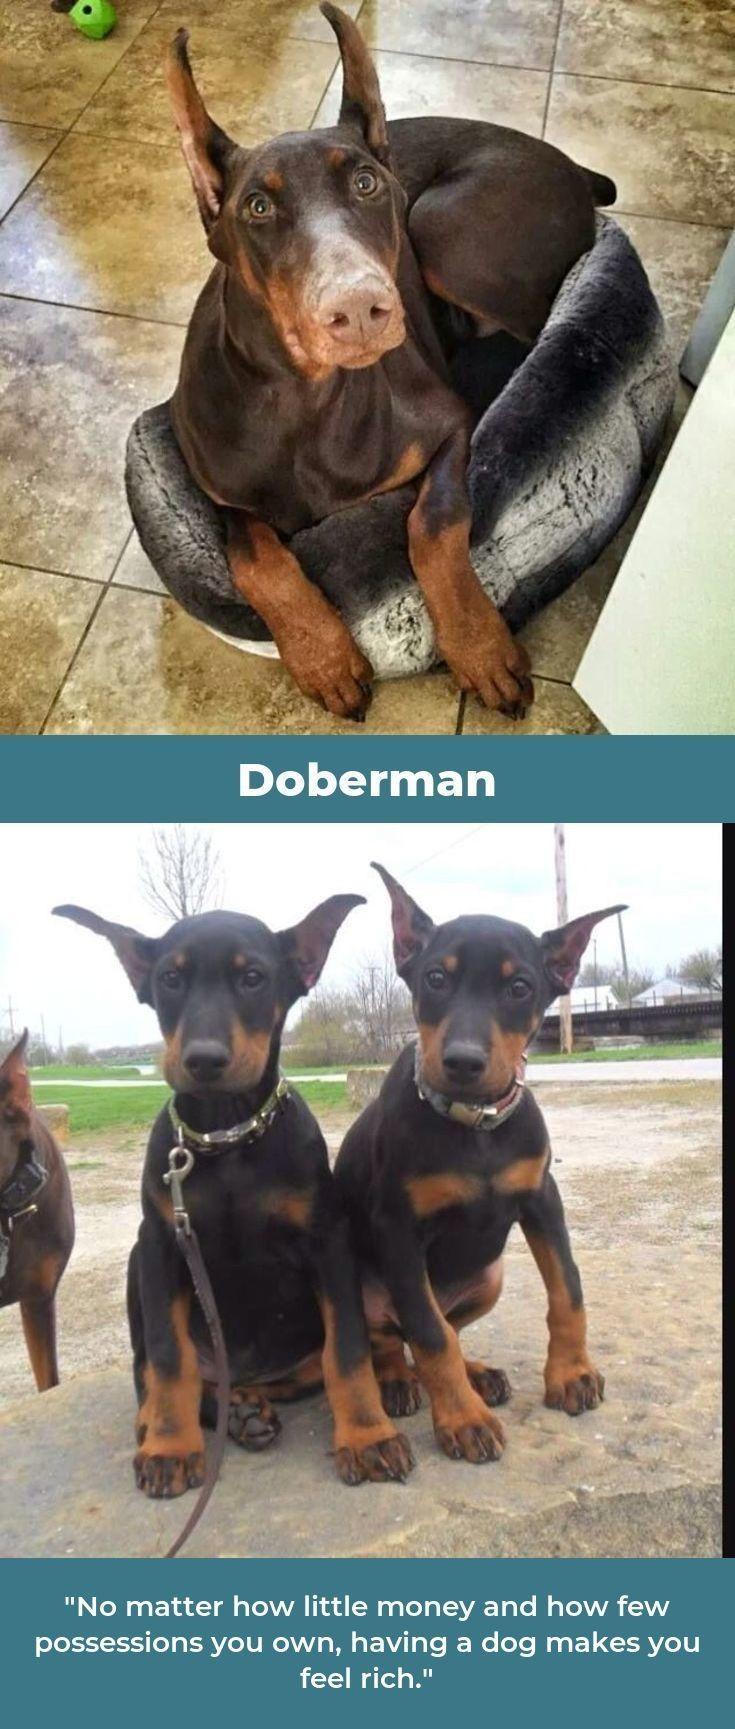 Dobermans Dobermannlove Dobermannlove Doberman Doberman